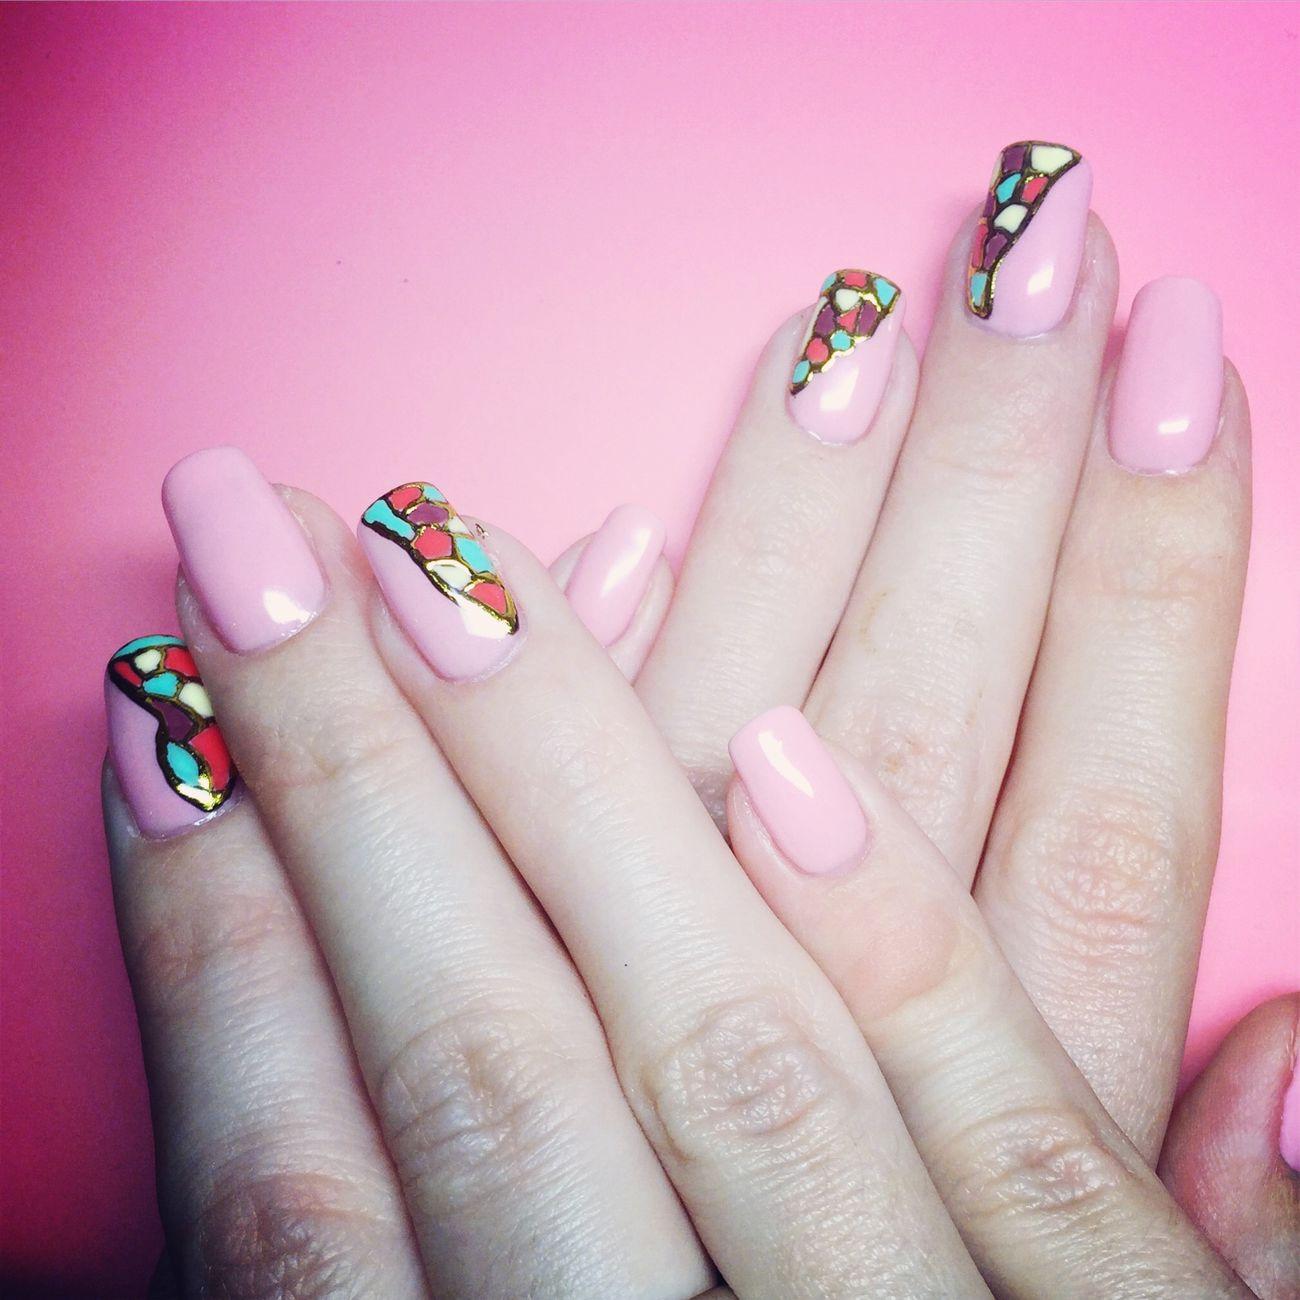 Nails Manicure Gellac Shellac